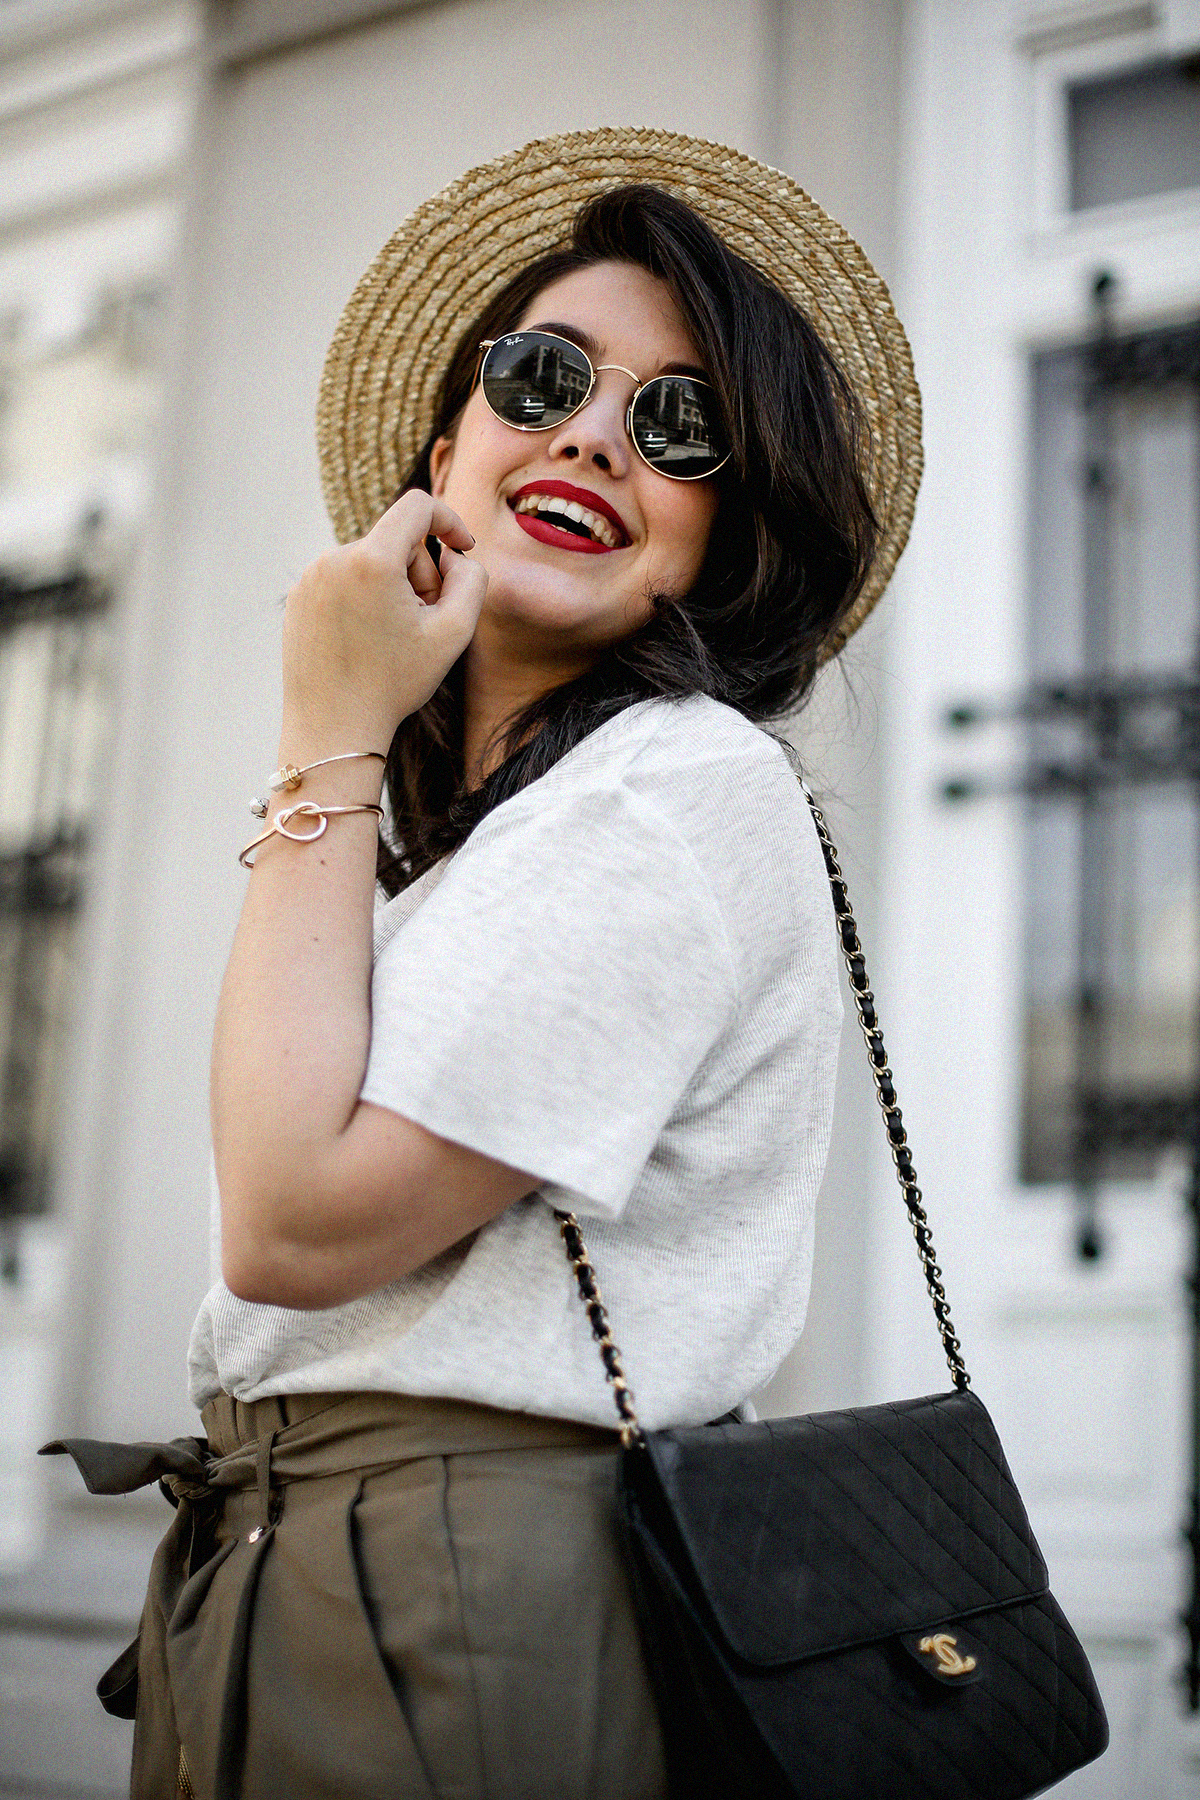 pantalones-verdes-altos-palas-borlas-zara-canotier-look-myblueberrynightsblog13